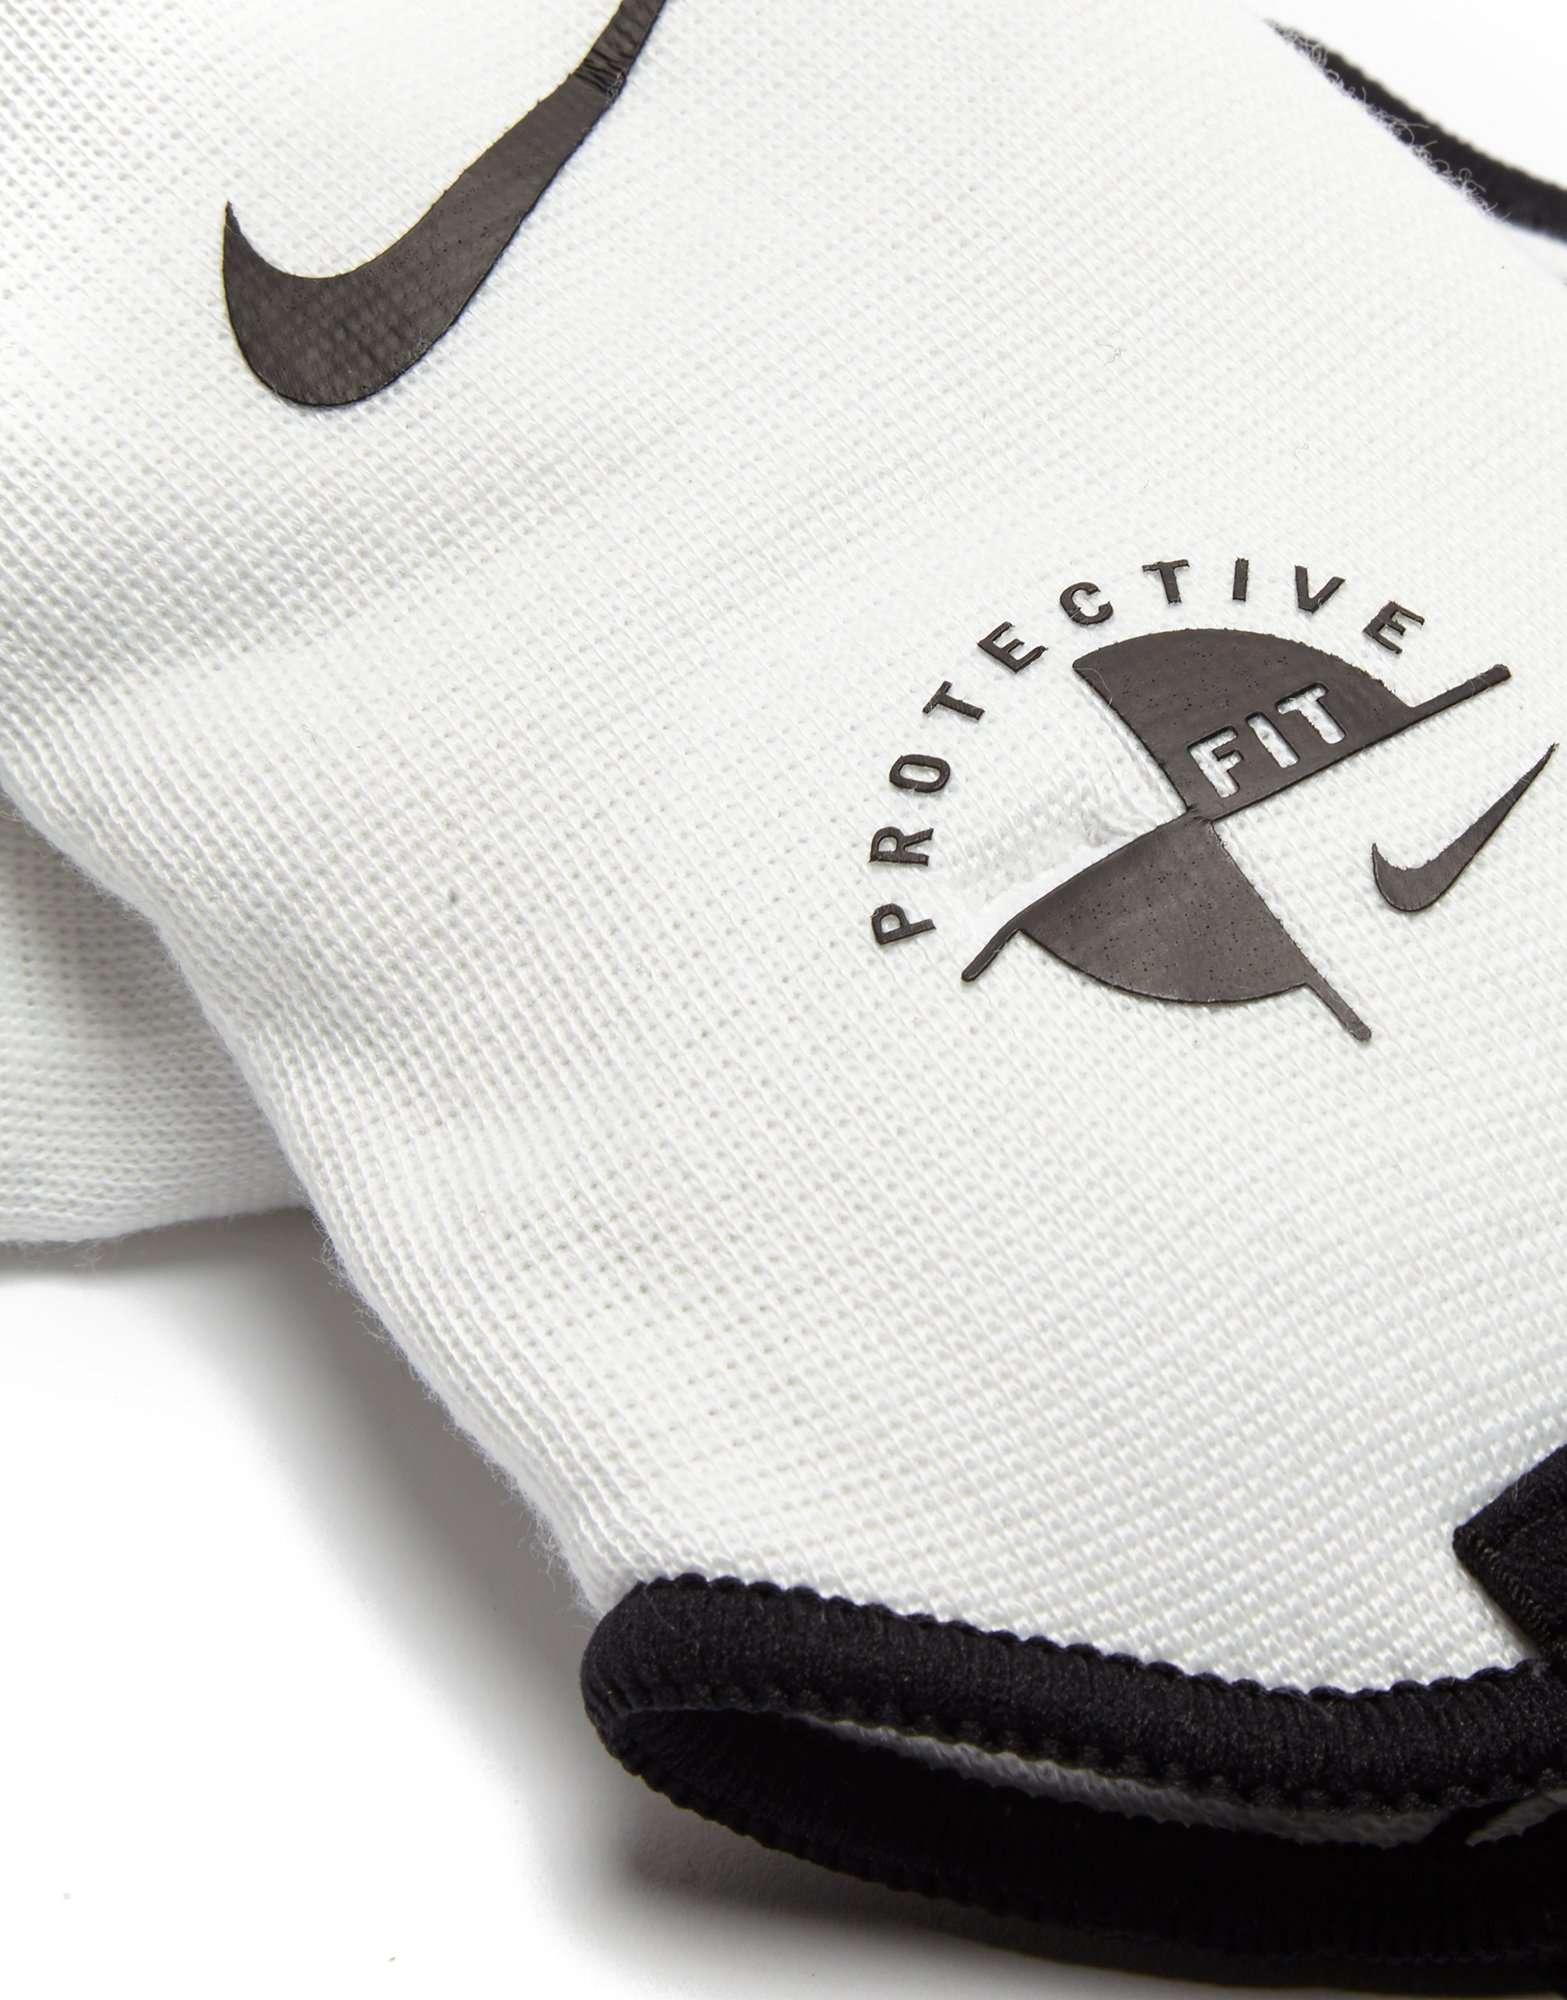 Nike Ankle Shield